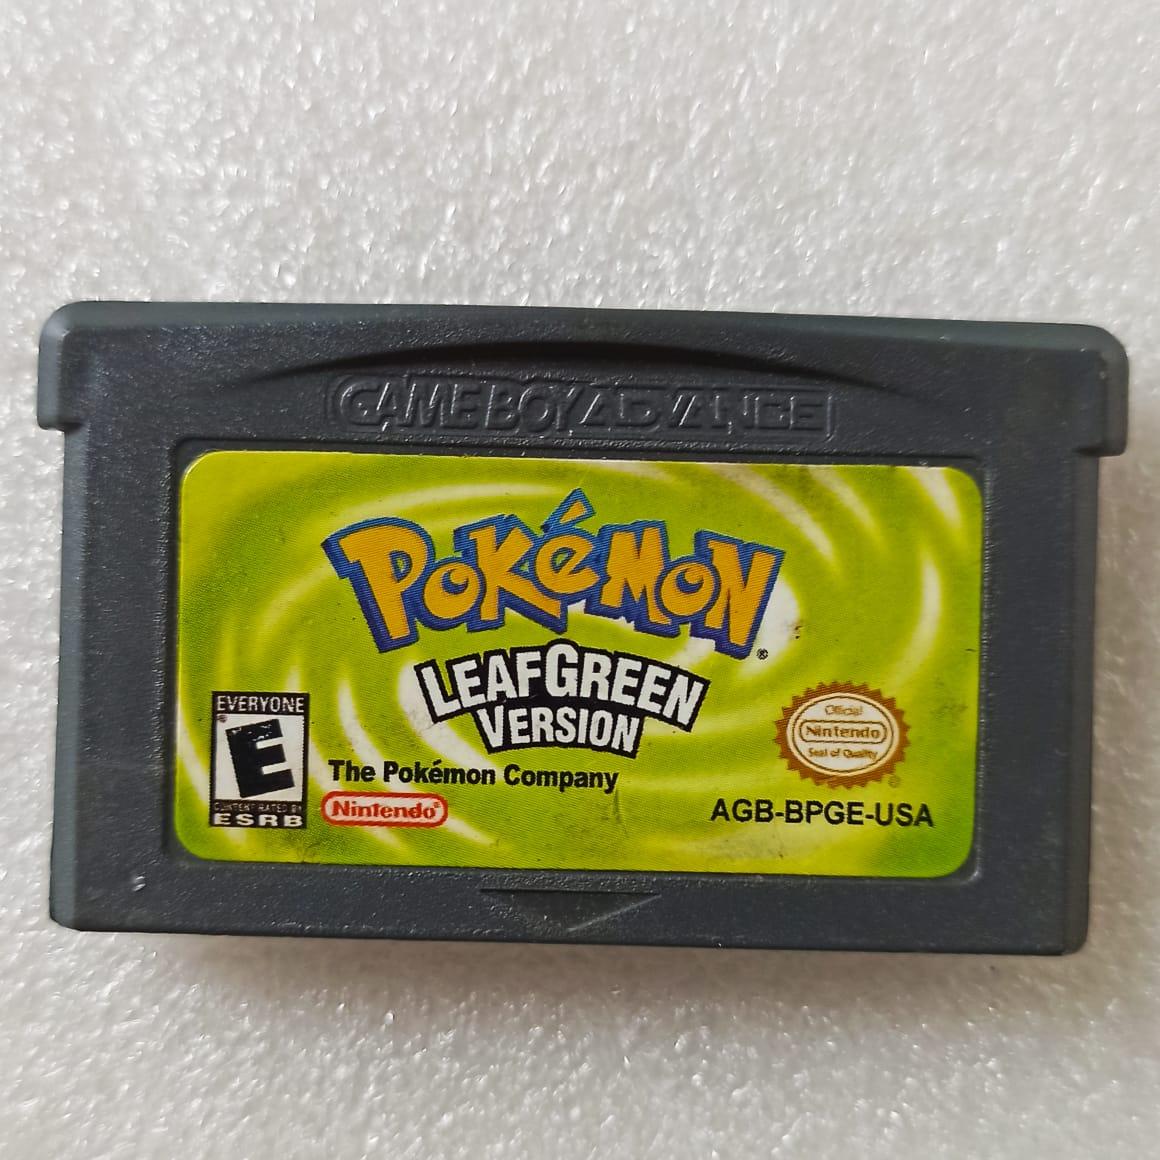 Pokémon: LeafGreen Version - USADO - GBA